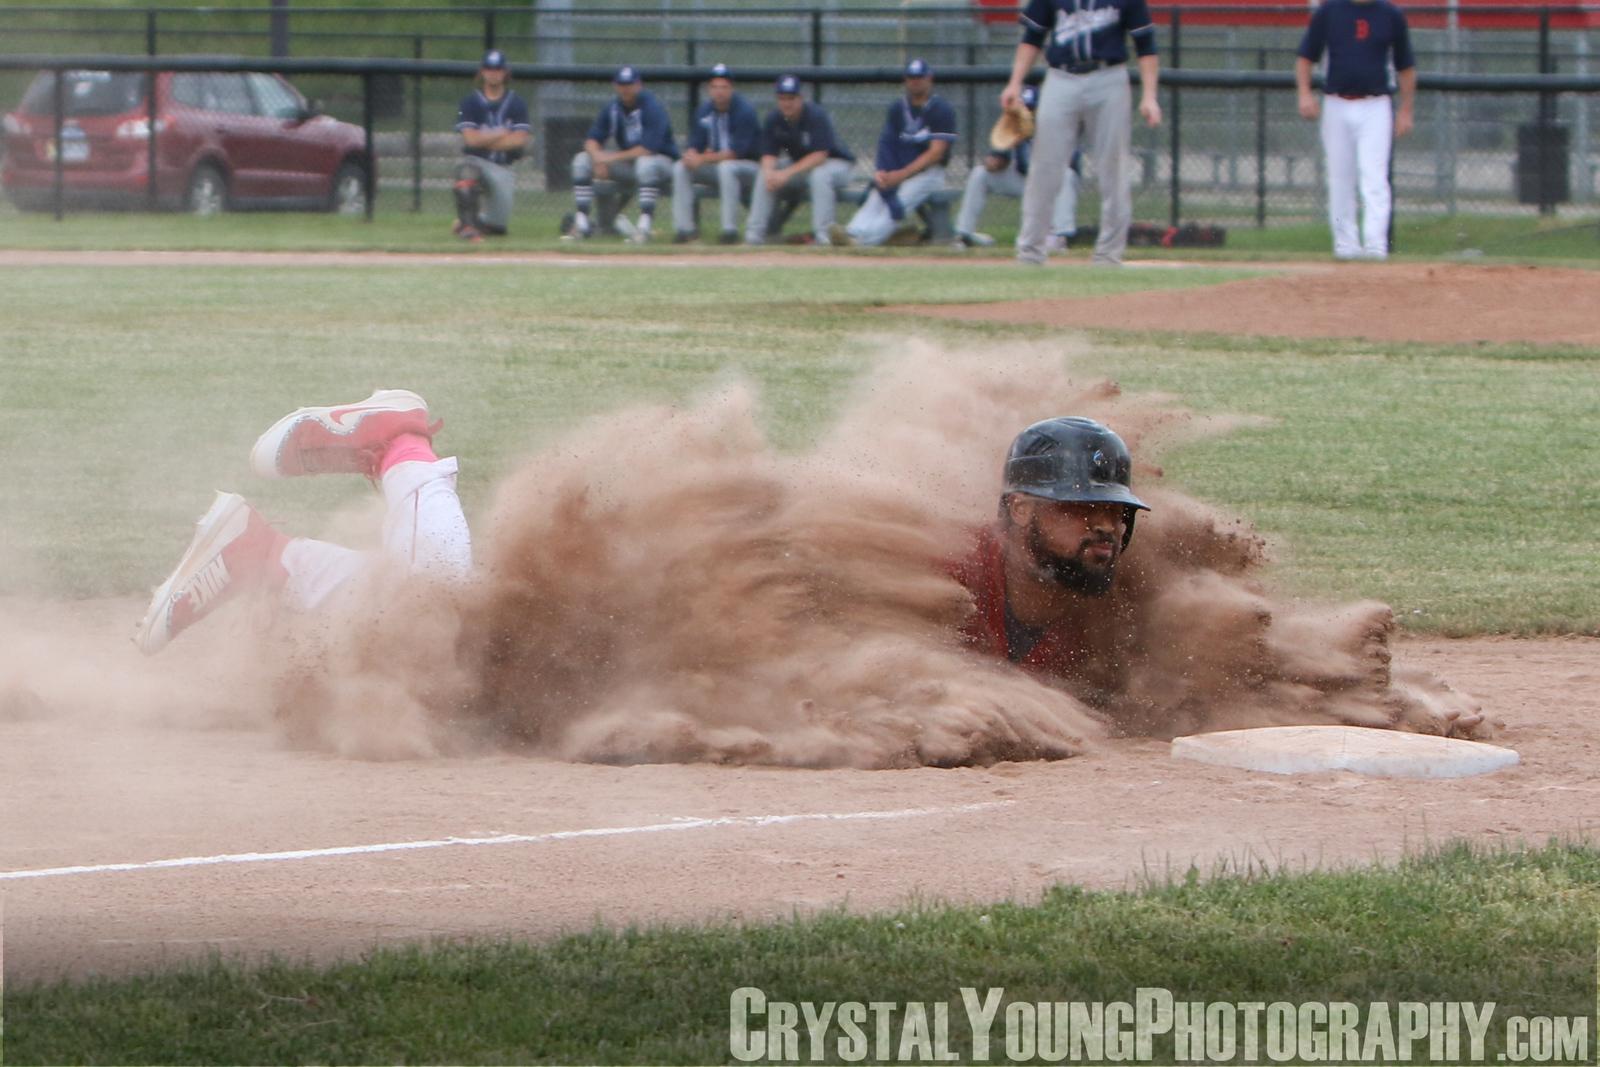 Brantford Red Sox vs. Barrie Baycats June 3, 2018